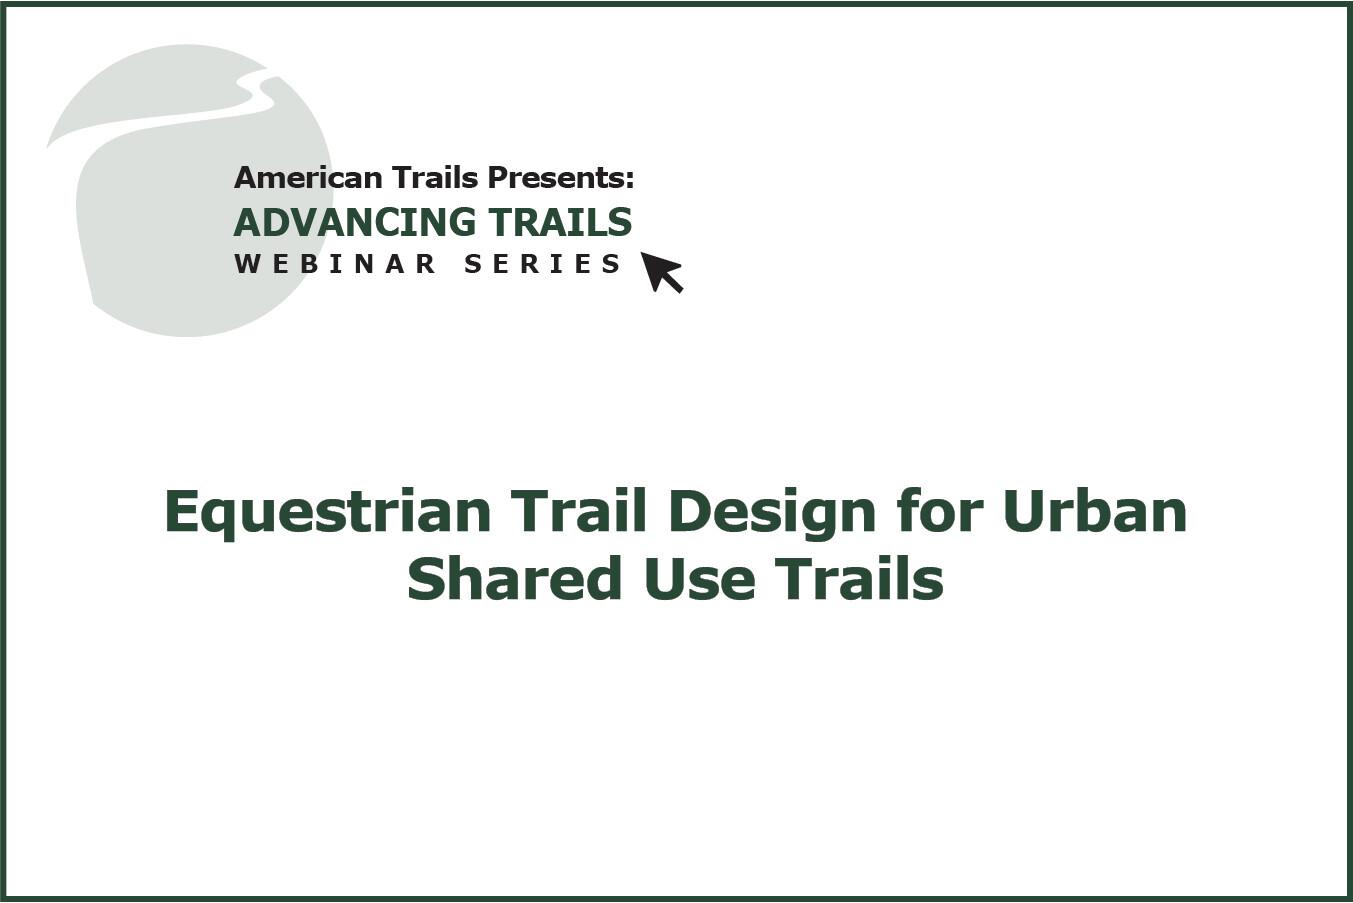 Equestrian Trail Design for Urban Shared Use Trails (RECORDING)